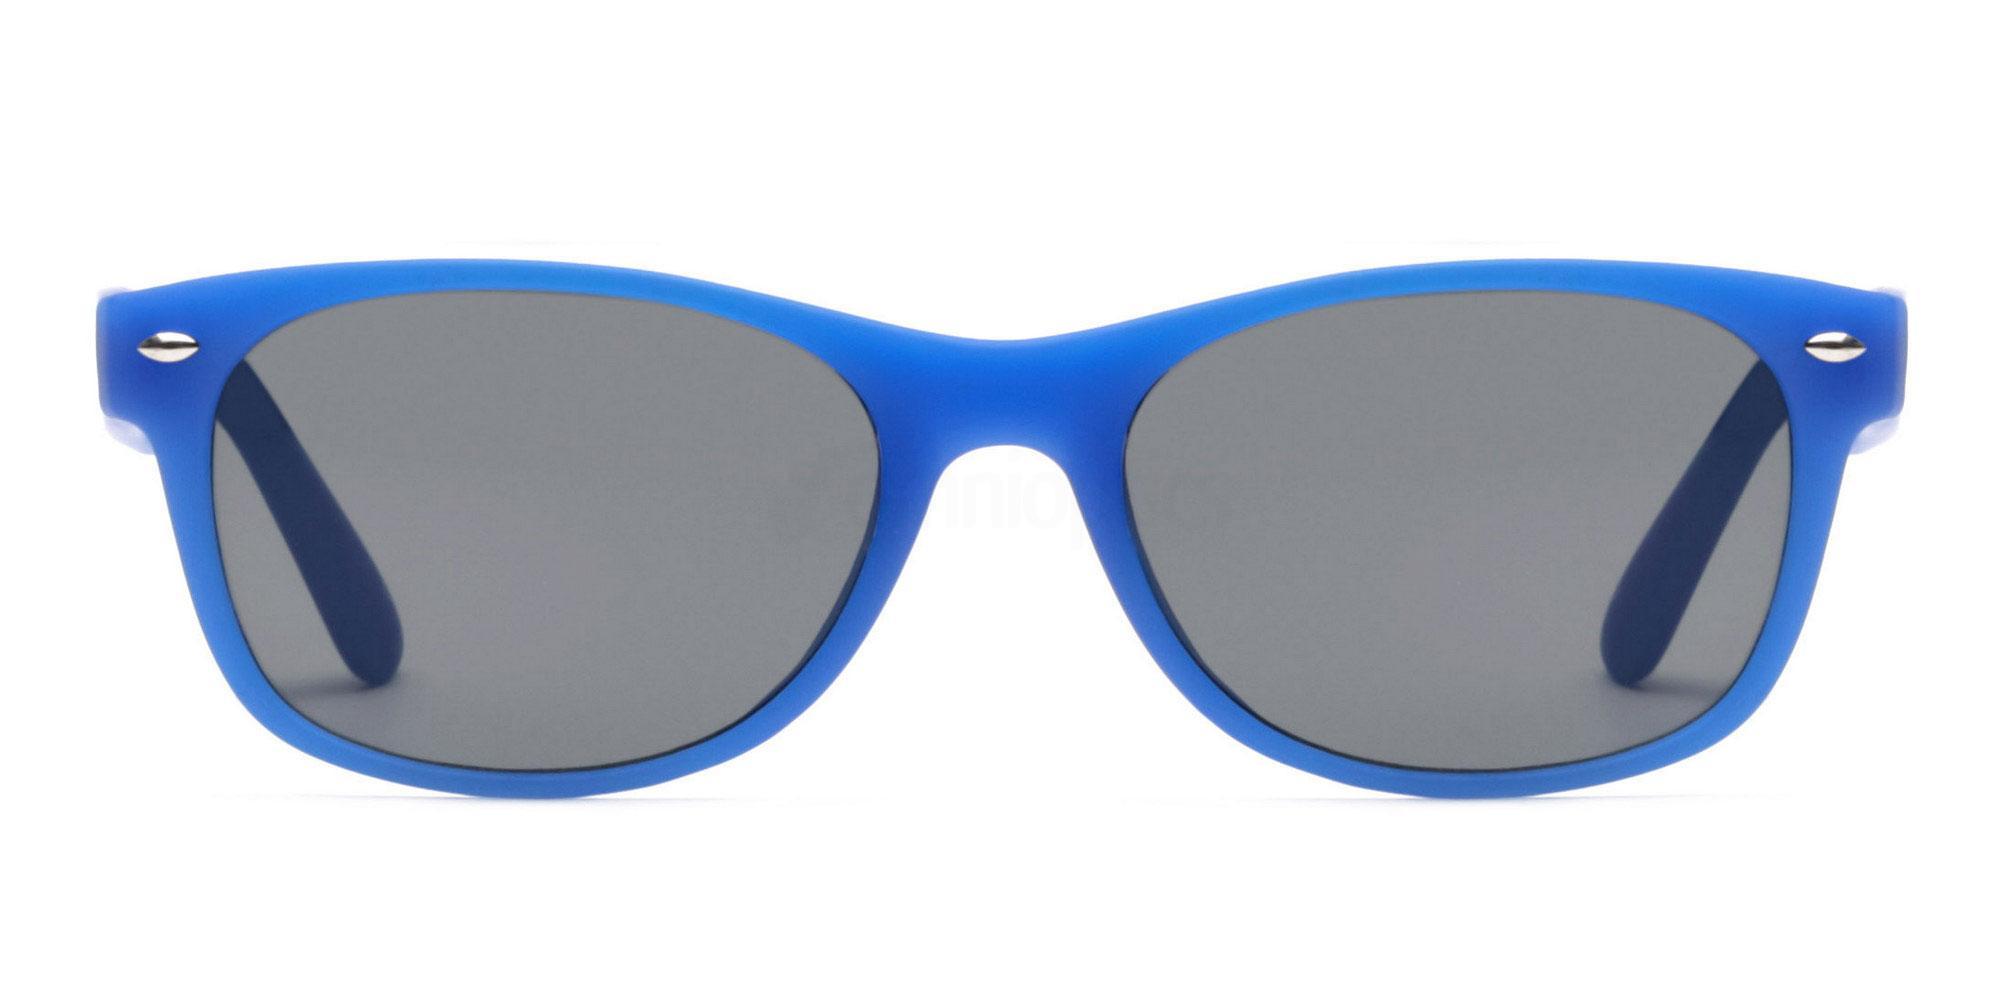 Dark Blue S8122 - Dark Blue (Sunglasses) Sunglasses, Savannah